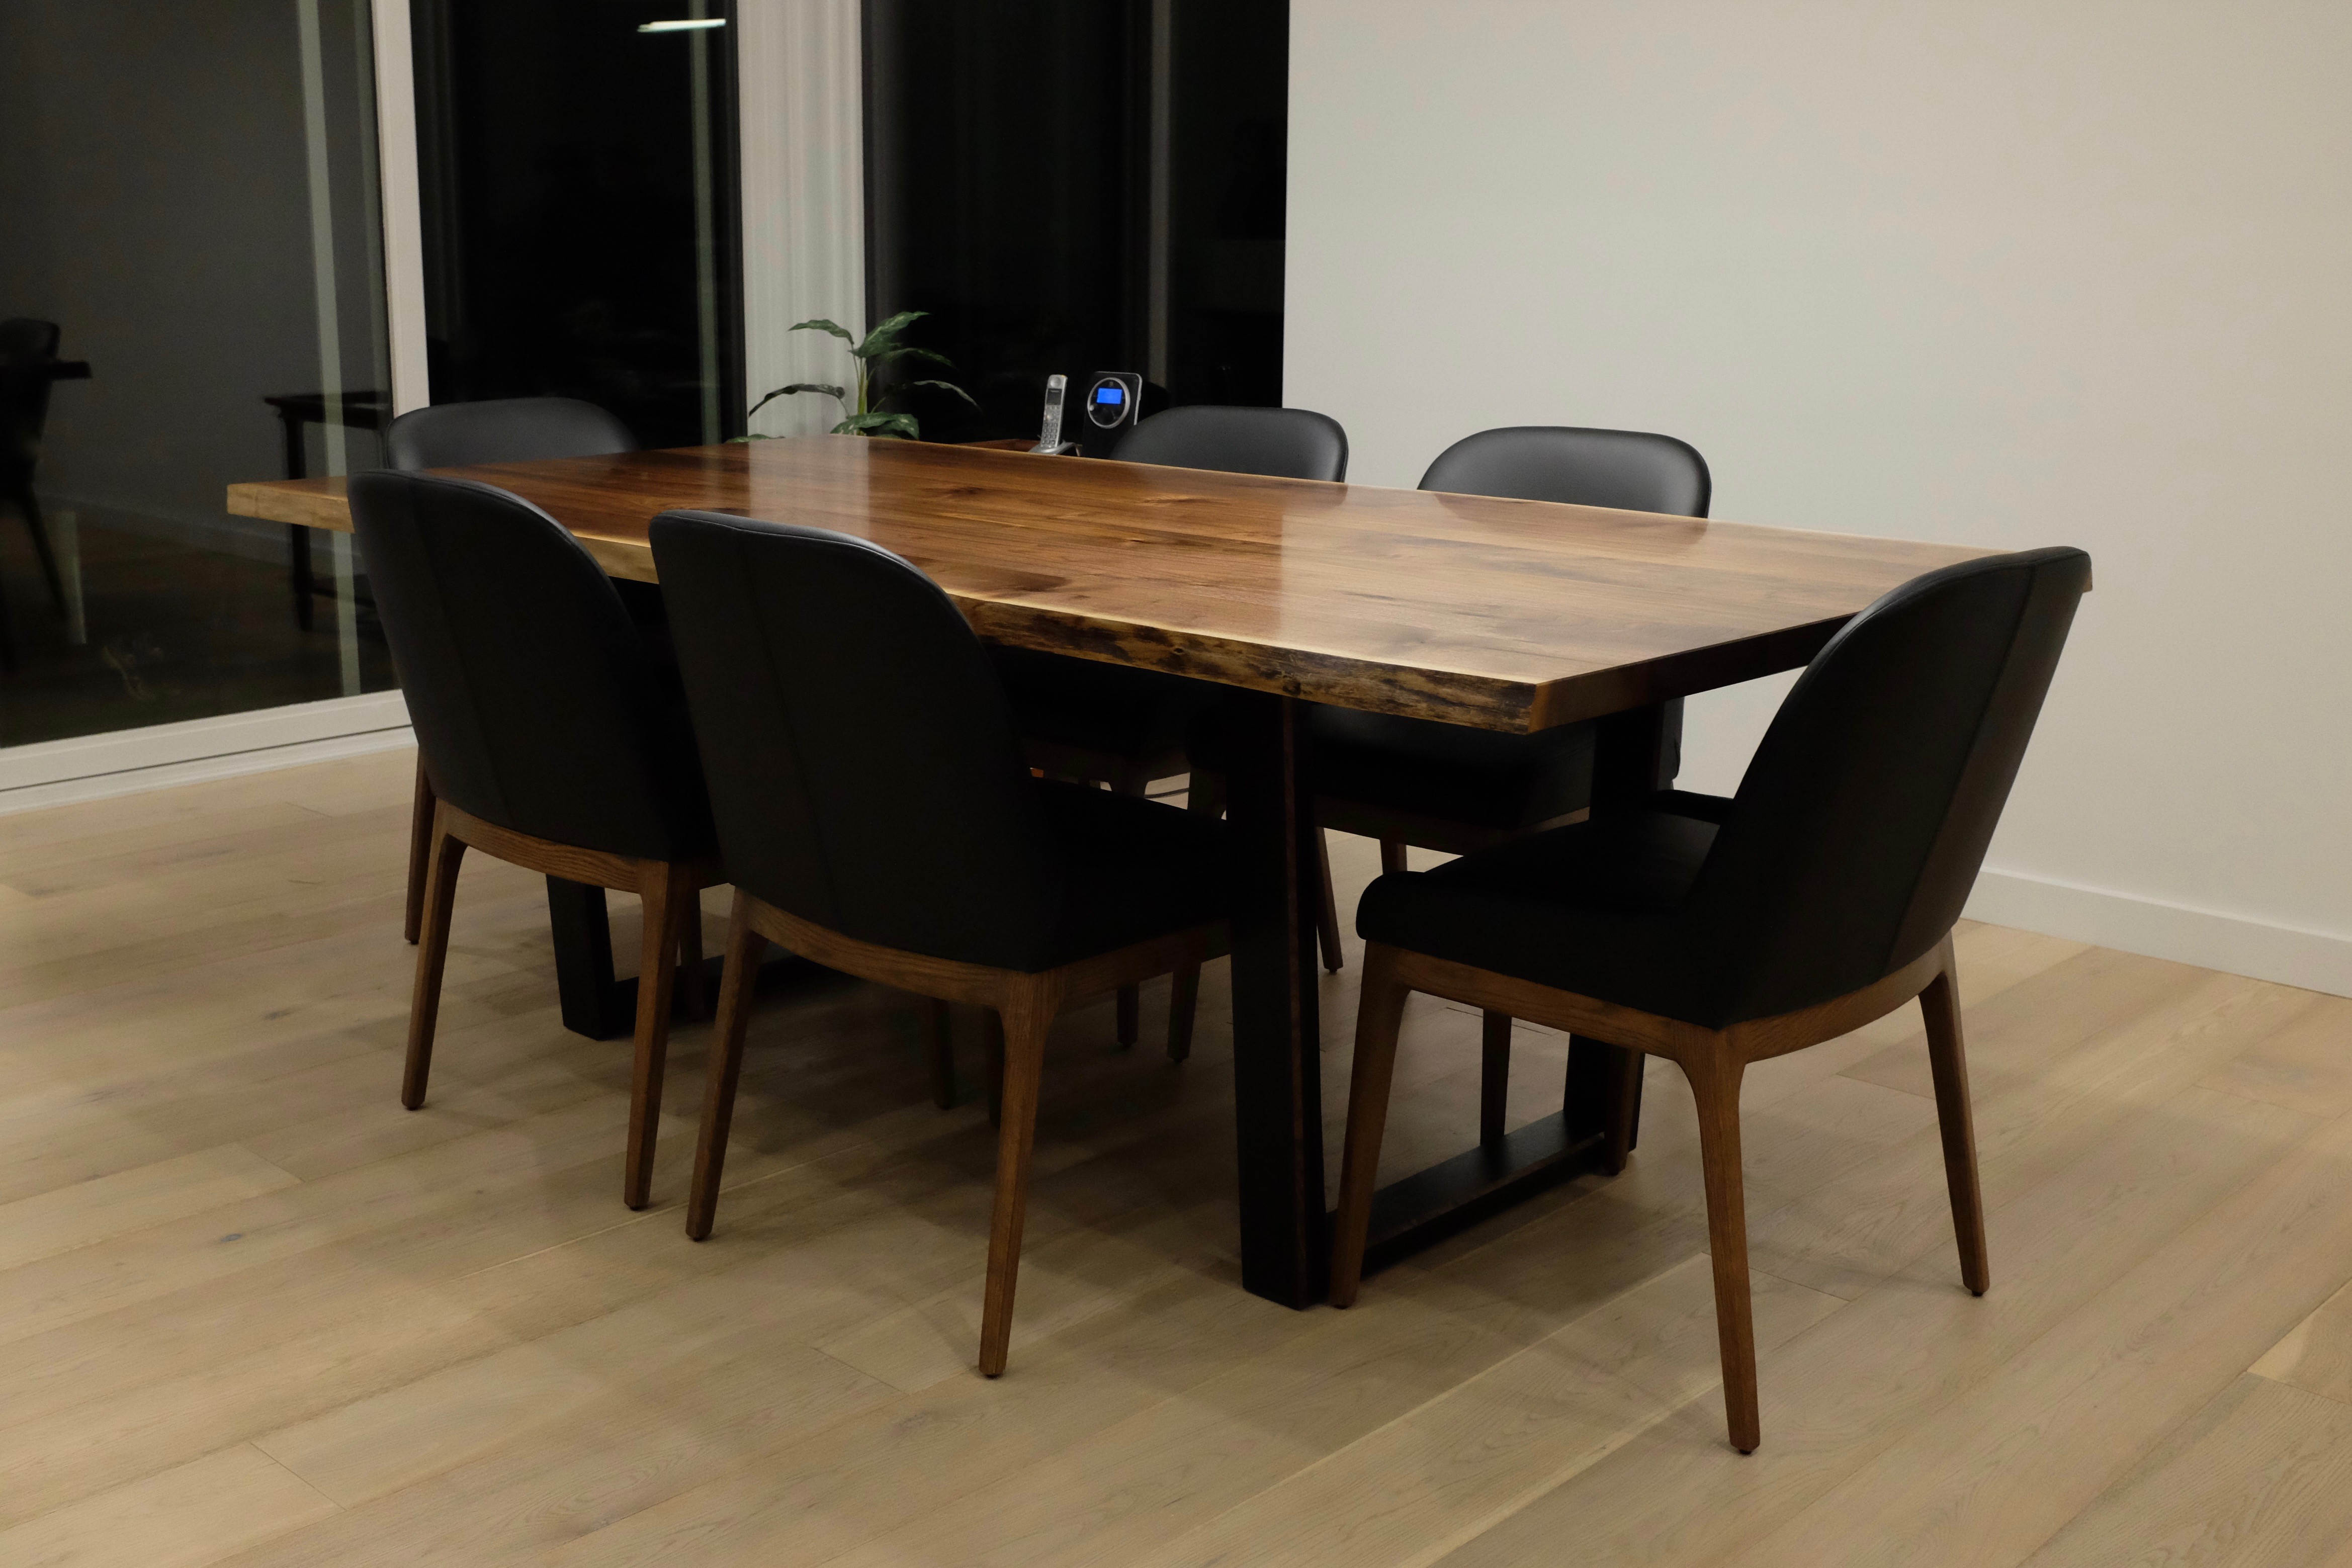 Walnut live-edge dining table